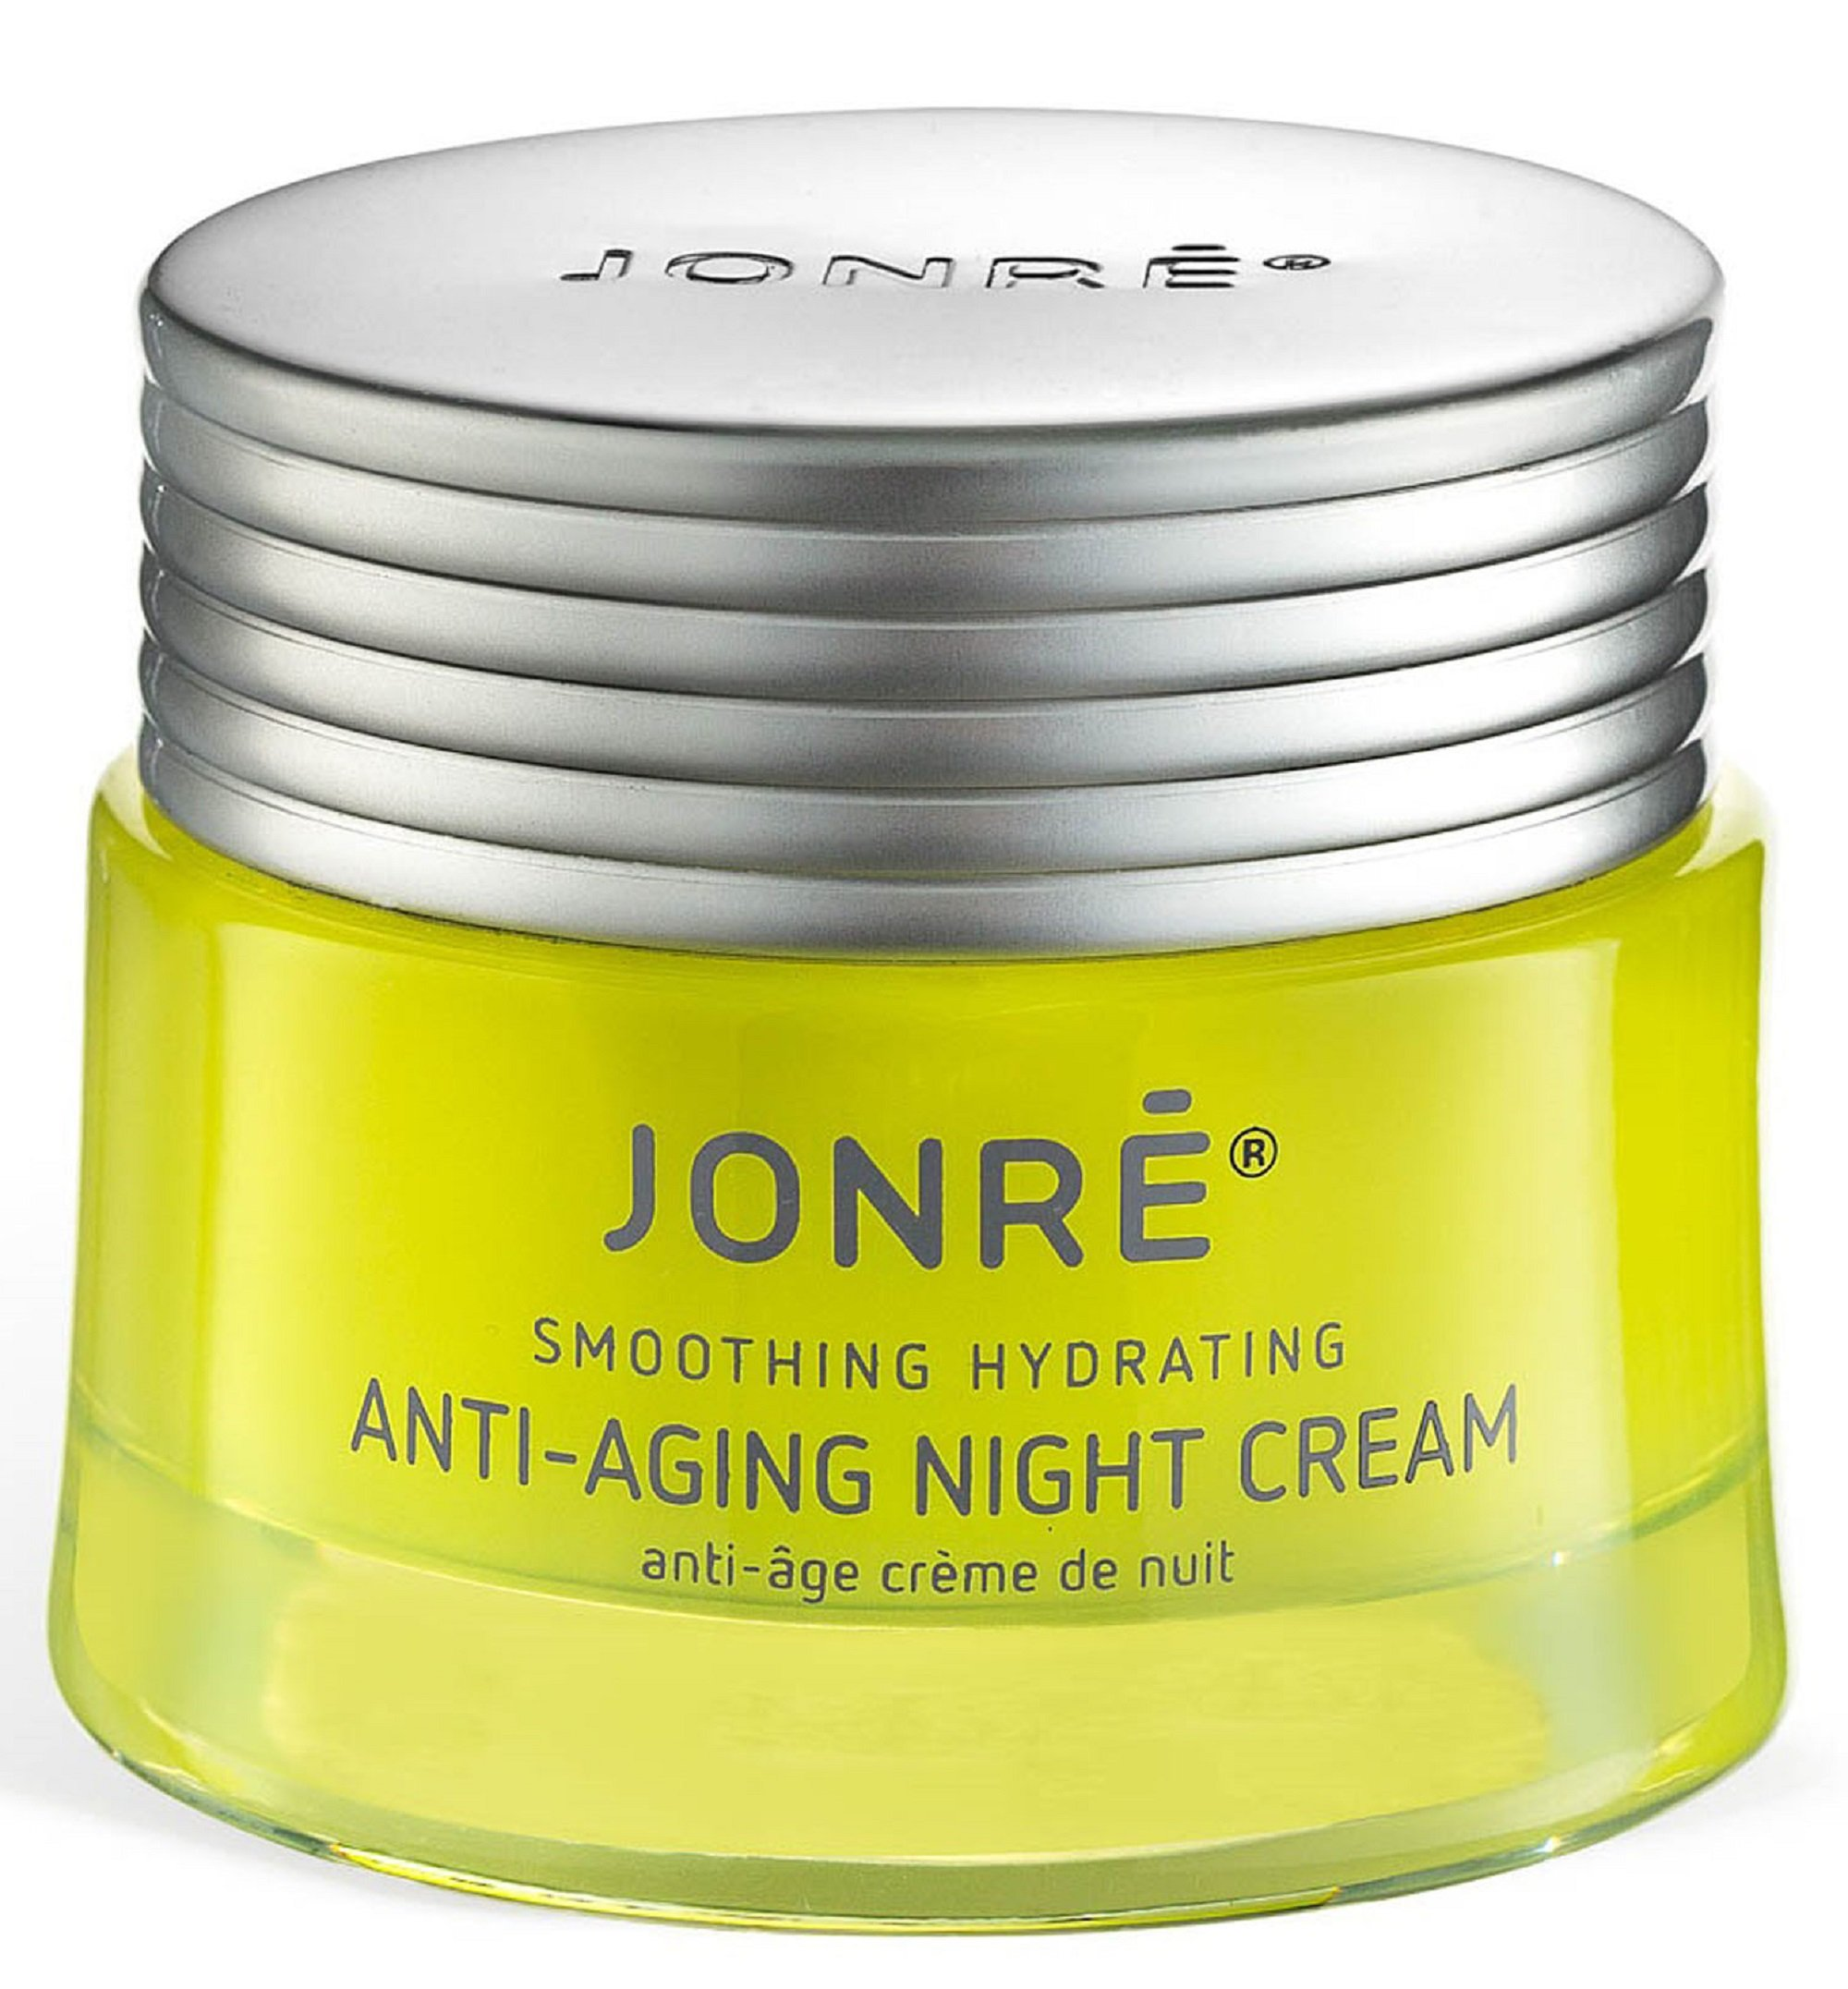 Jonre ANTI AGING NIGHT CREAM, FACE MOISTURIZER, FREE YOUR DRY ROUGH CREASED SKIN 1.7oz